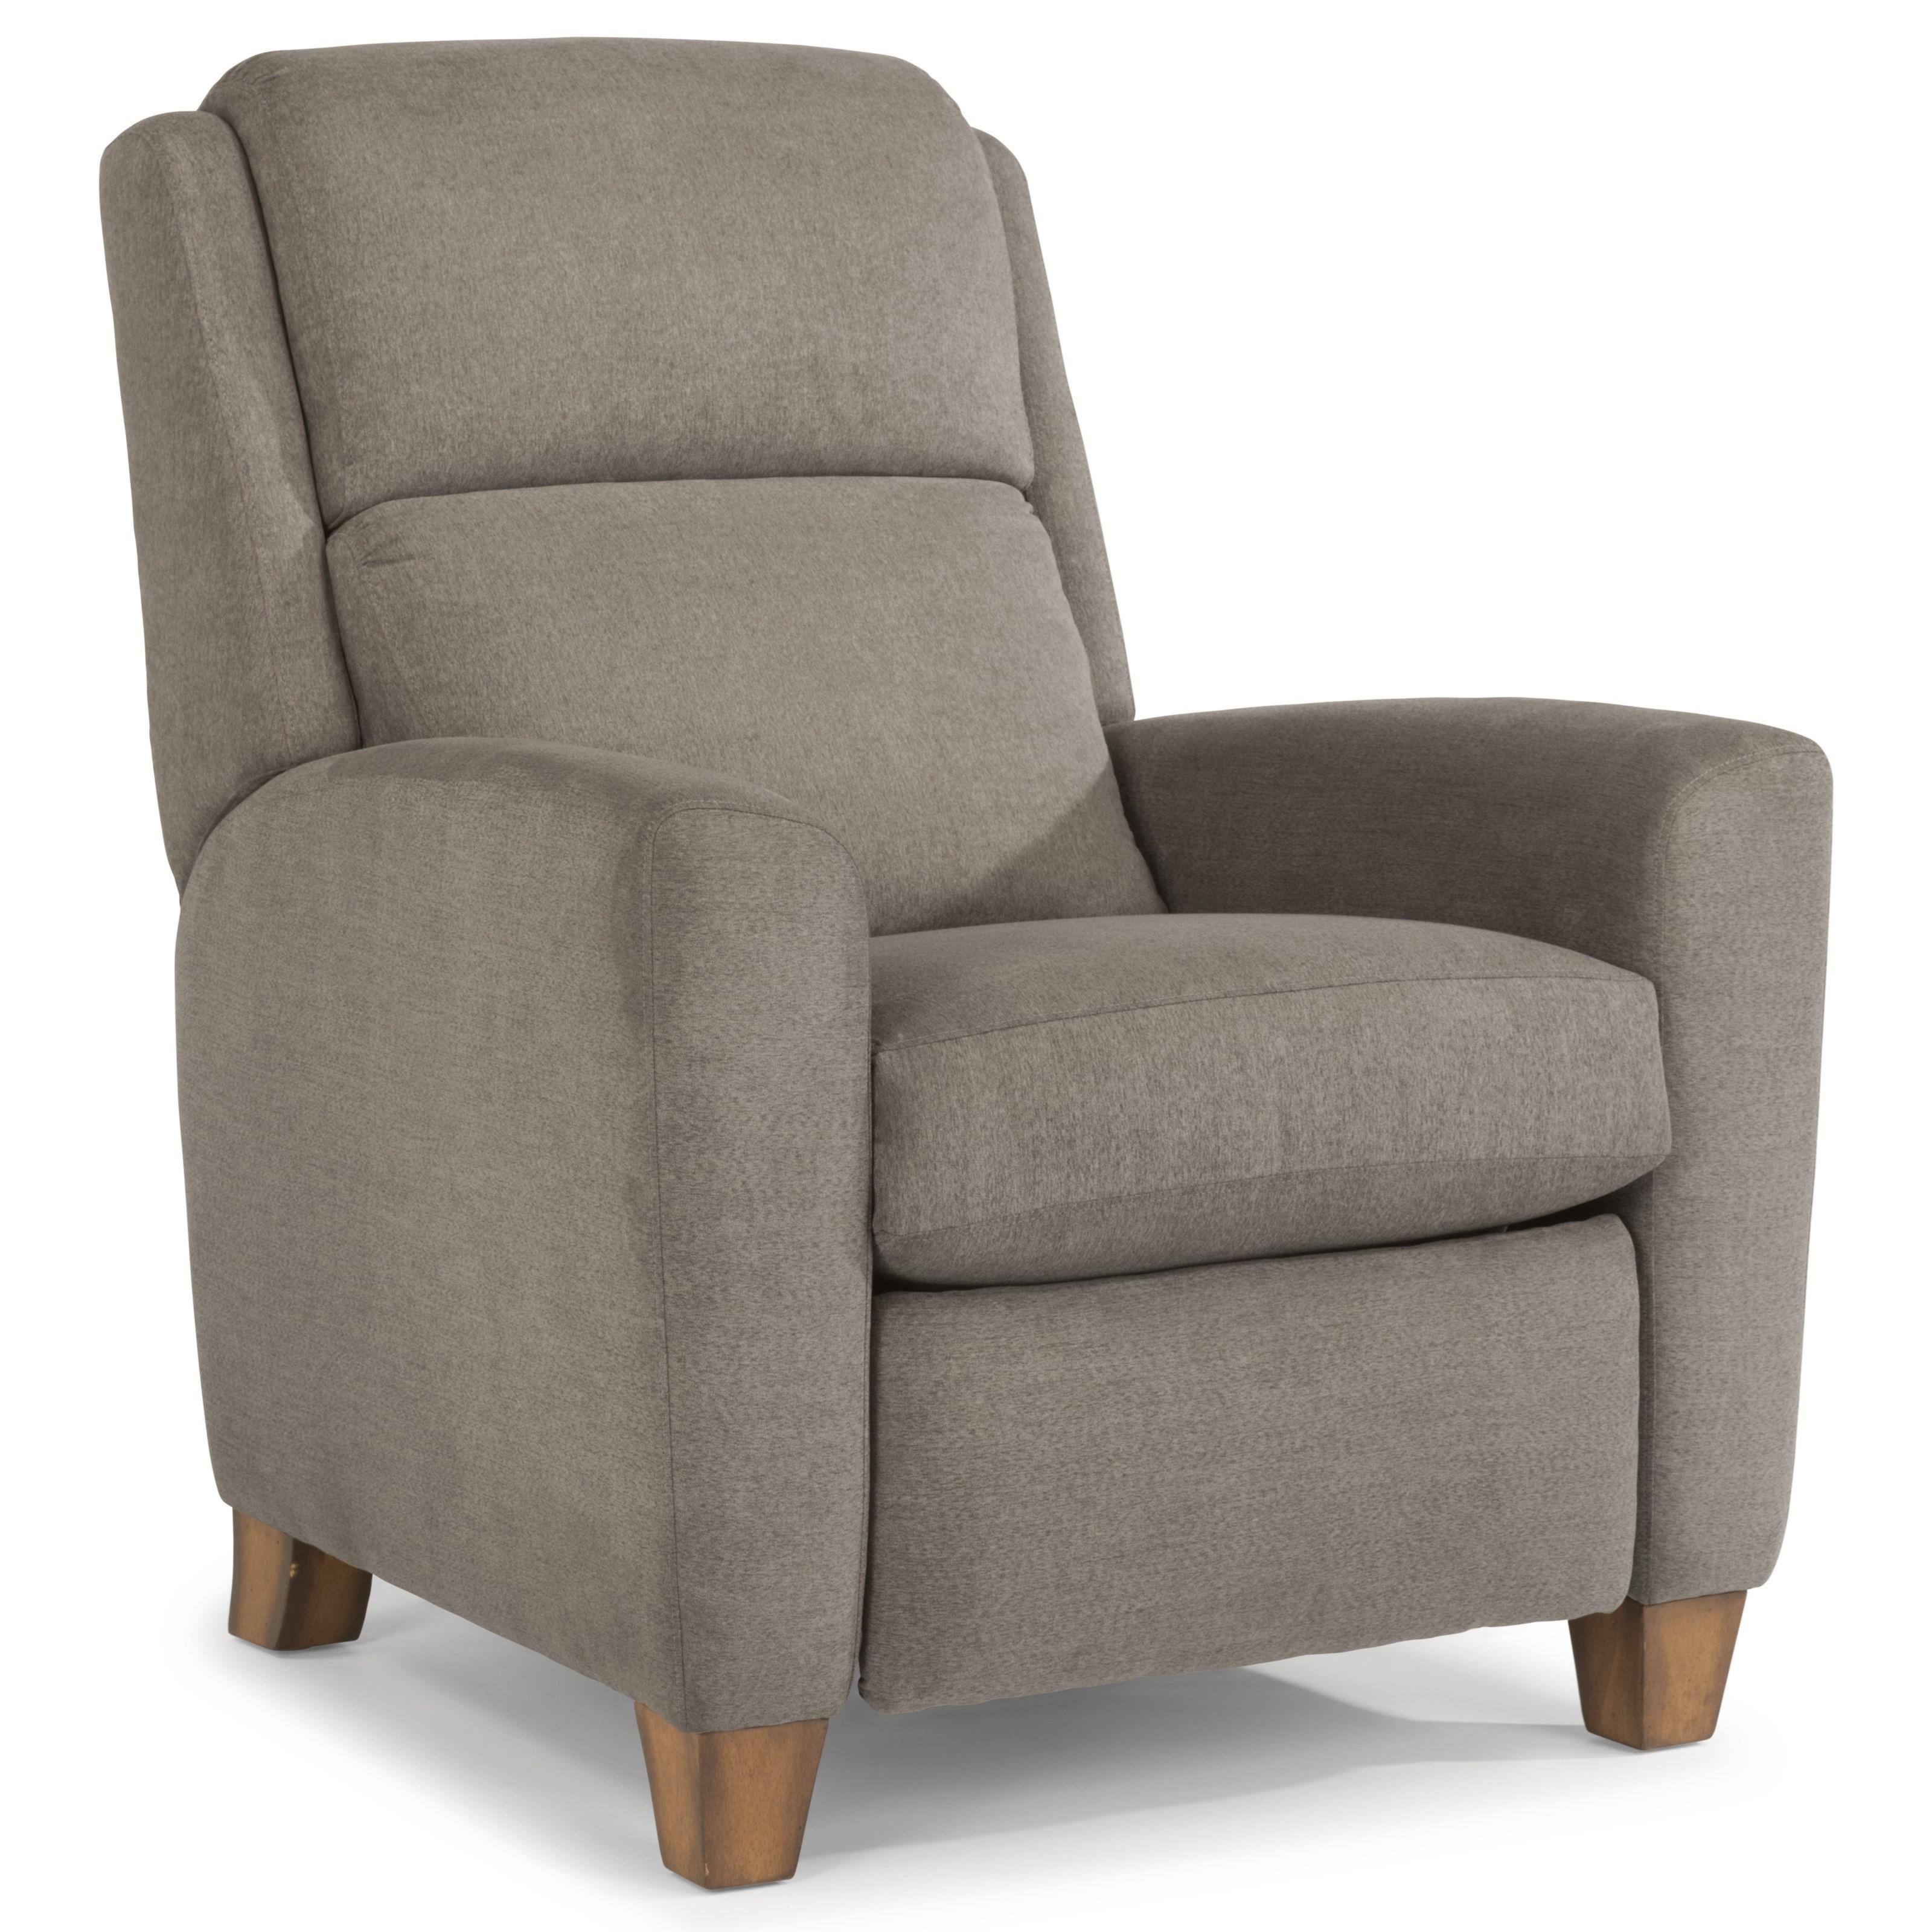 Flexsteel Westside Sofa Reviews: Flexsteel Dion 4520-503M Contemporary Power High-Leg